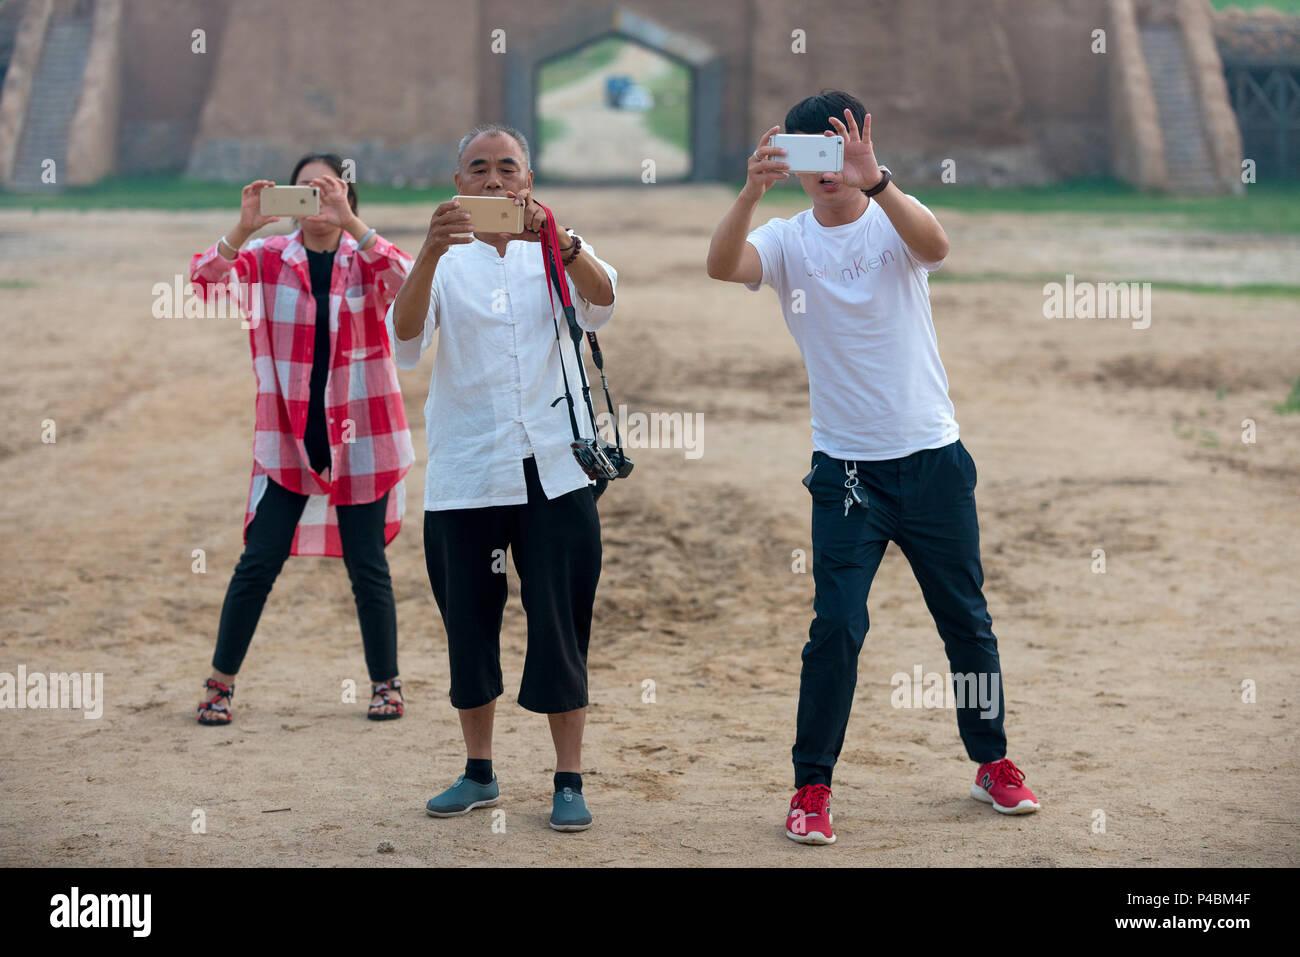 Tourists snap phone photographs at Zhenglanqi Wuyi Farm, Inner Mongolia, China, Inner Mongolia, China - Stock Image